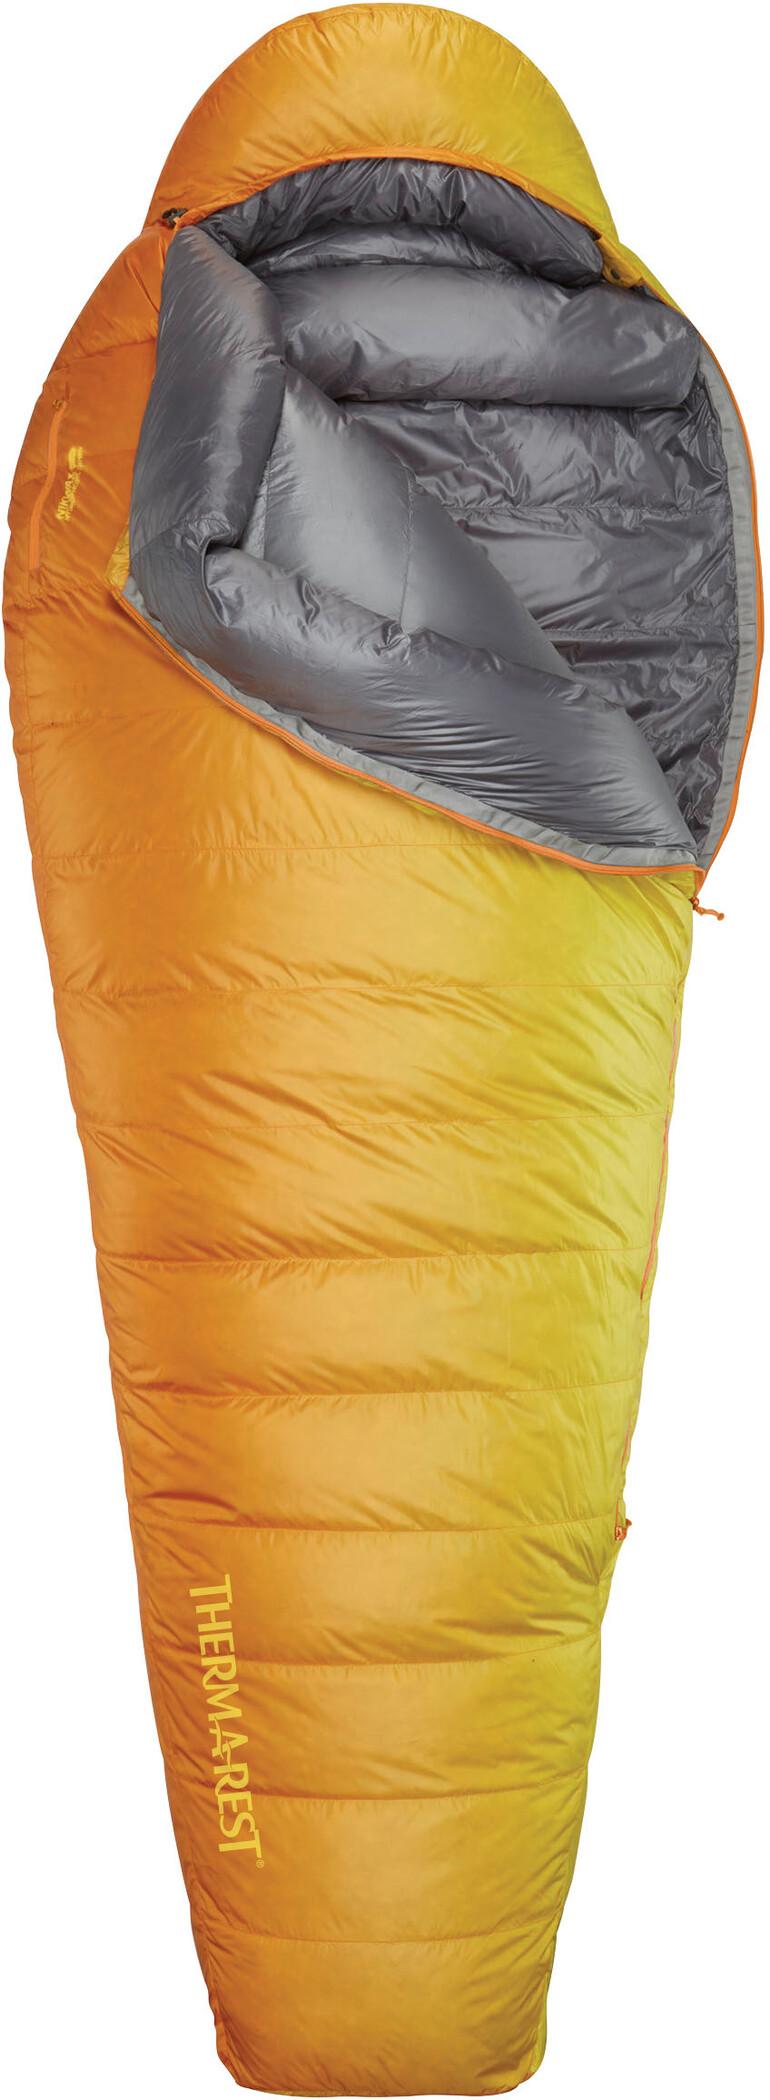 Therm-a-Rest Oberon 0 Sovepose Regulær, orange (2019) | Misc. Transportation and Storage